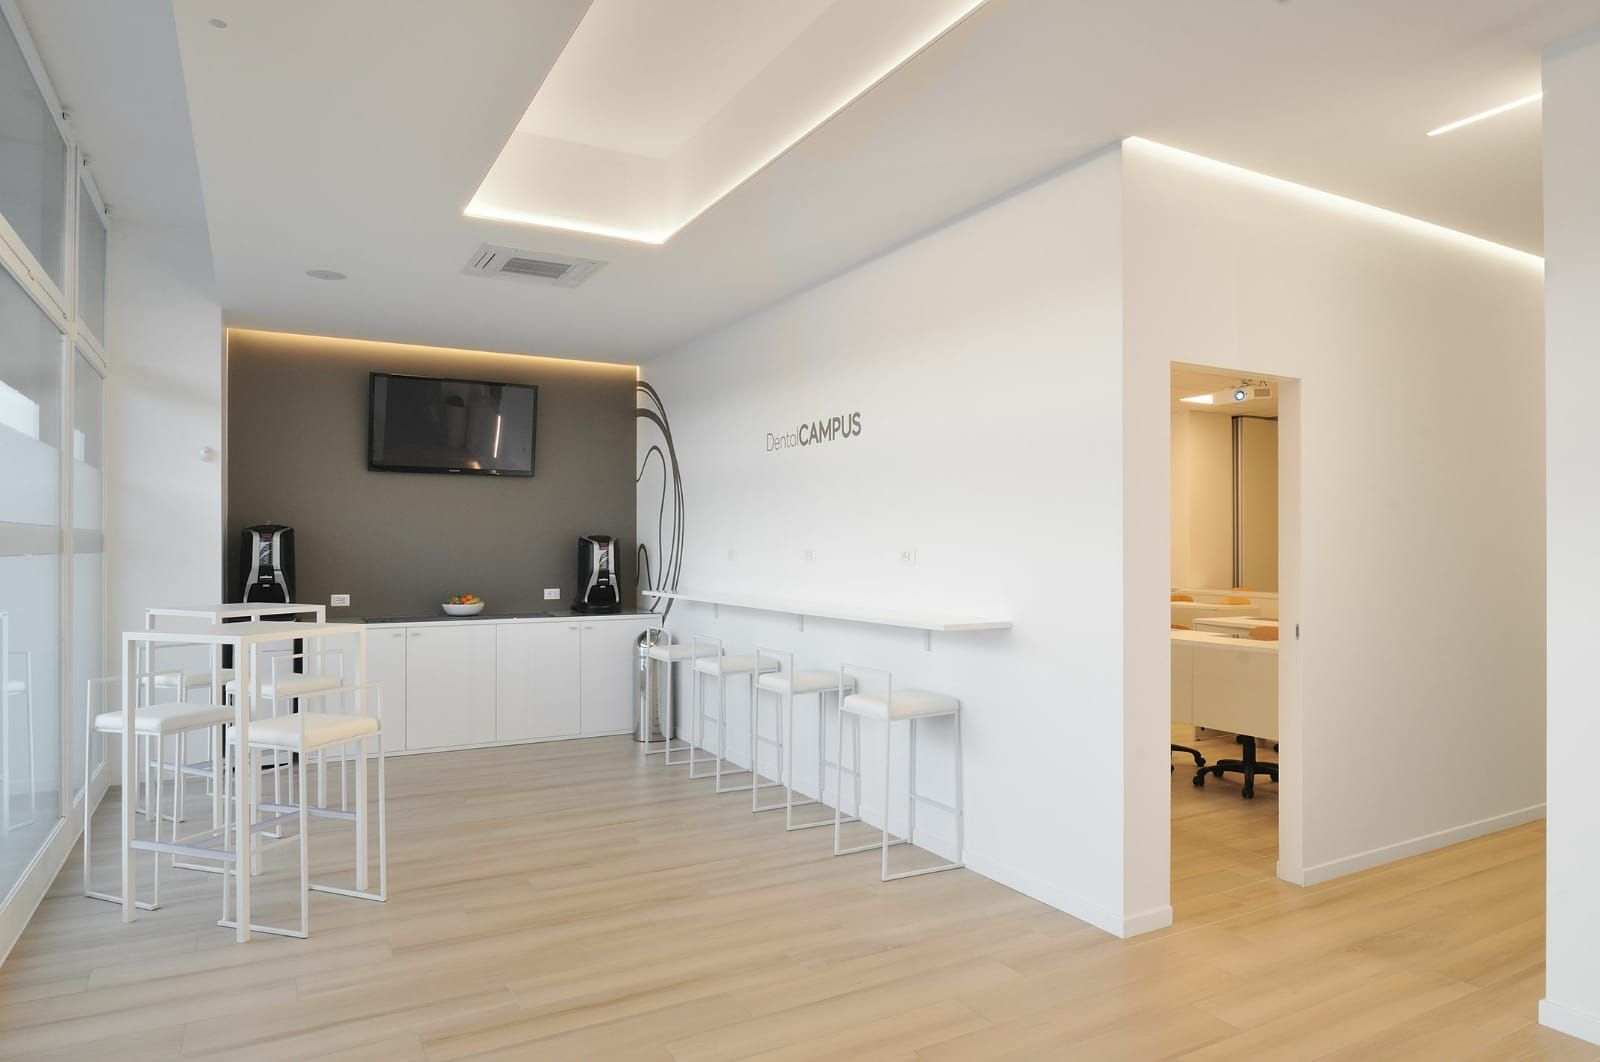 Centro Corsi - DentalCampus